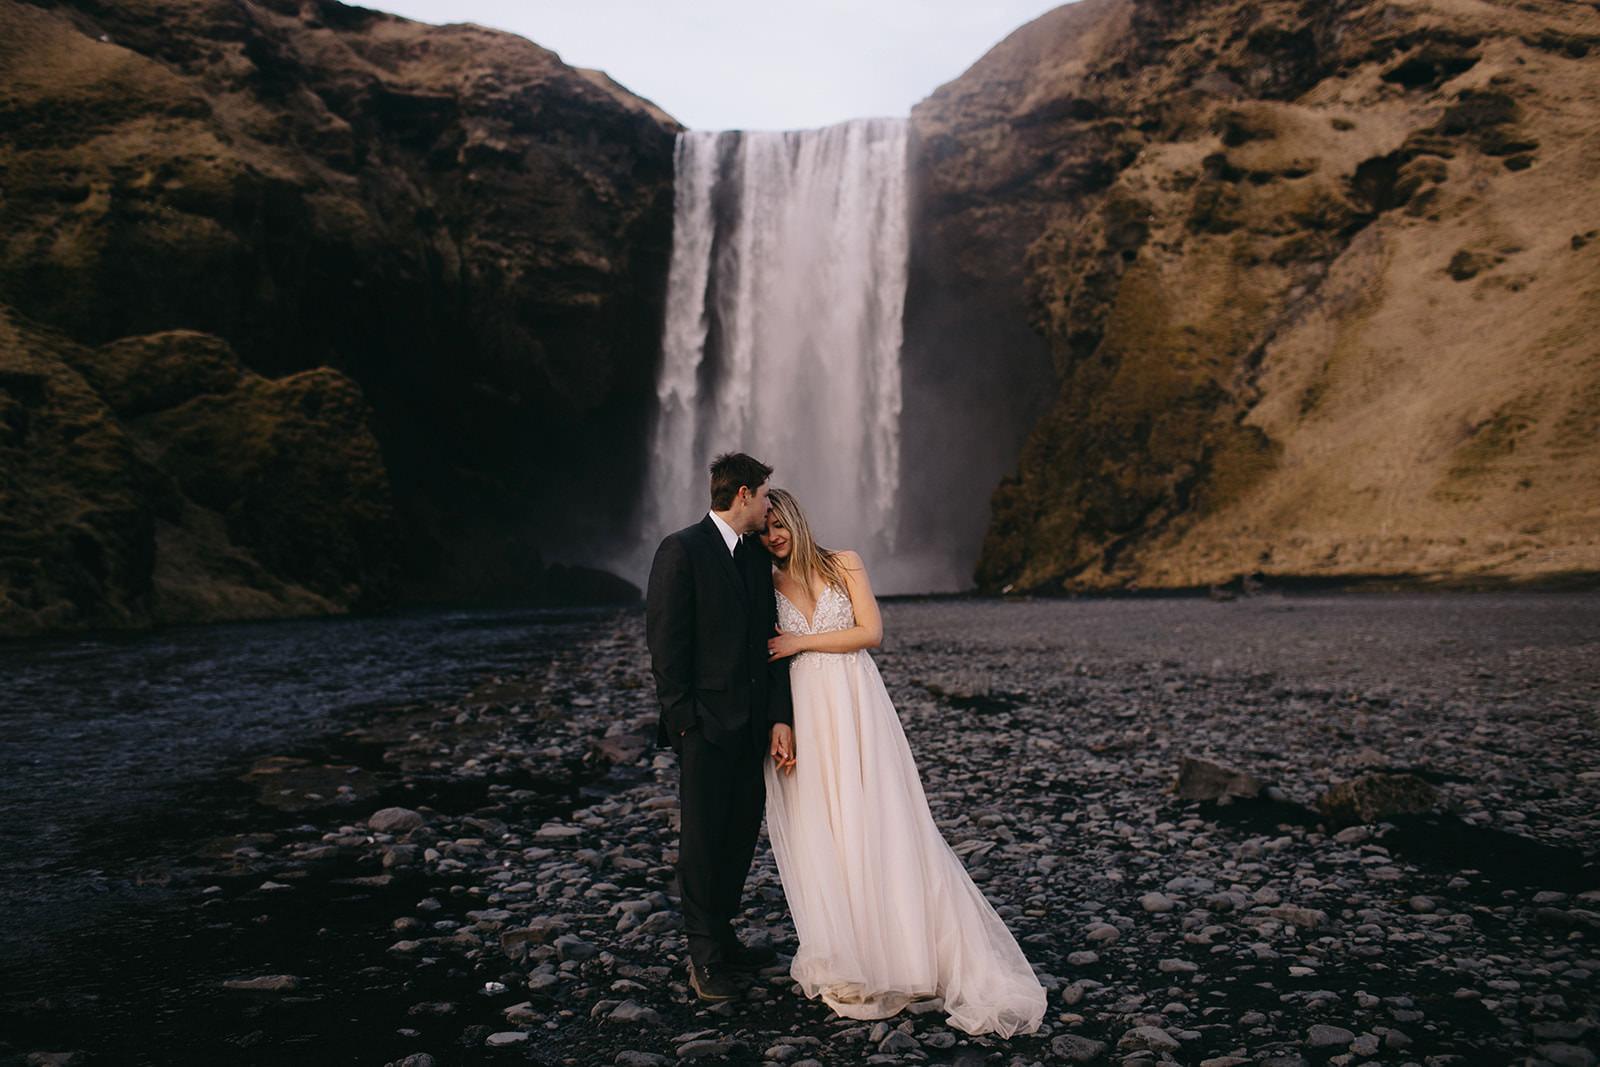 Icelandic Iceland Elopement Wedding Elope Photographer Eloping Reykjavík Vik Black Sand Beach Jökulsárlón Skogafoss Waterfall Vestrahorn Mountain Liz Osban Photography Destination 110.jpg